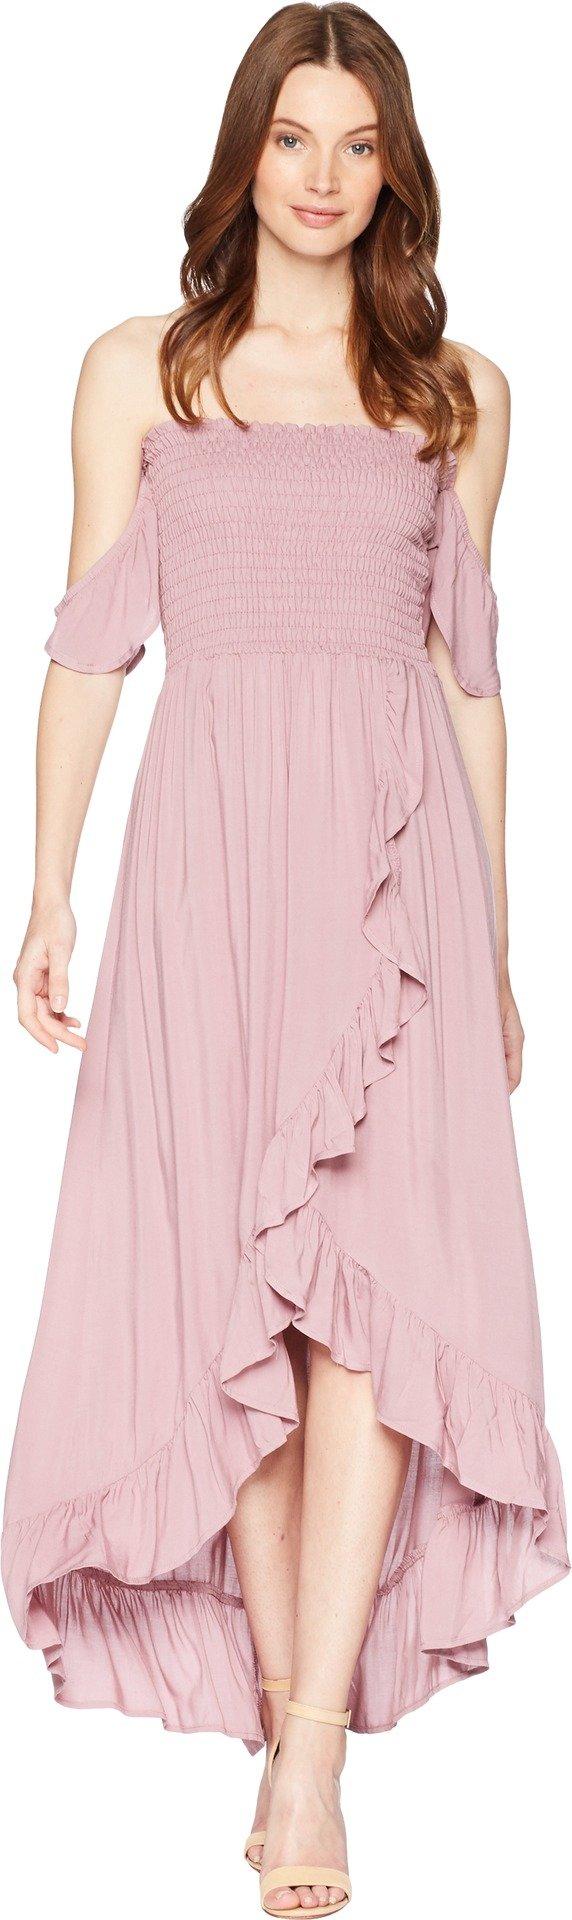 Lucy Love Women's Wild Hearts Dress, Amethyst, Small